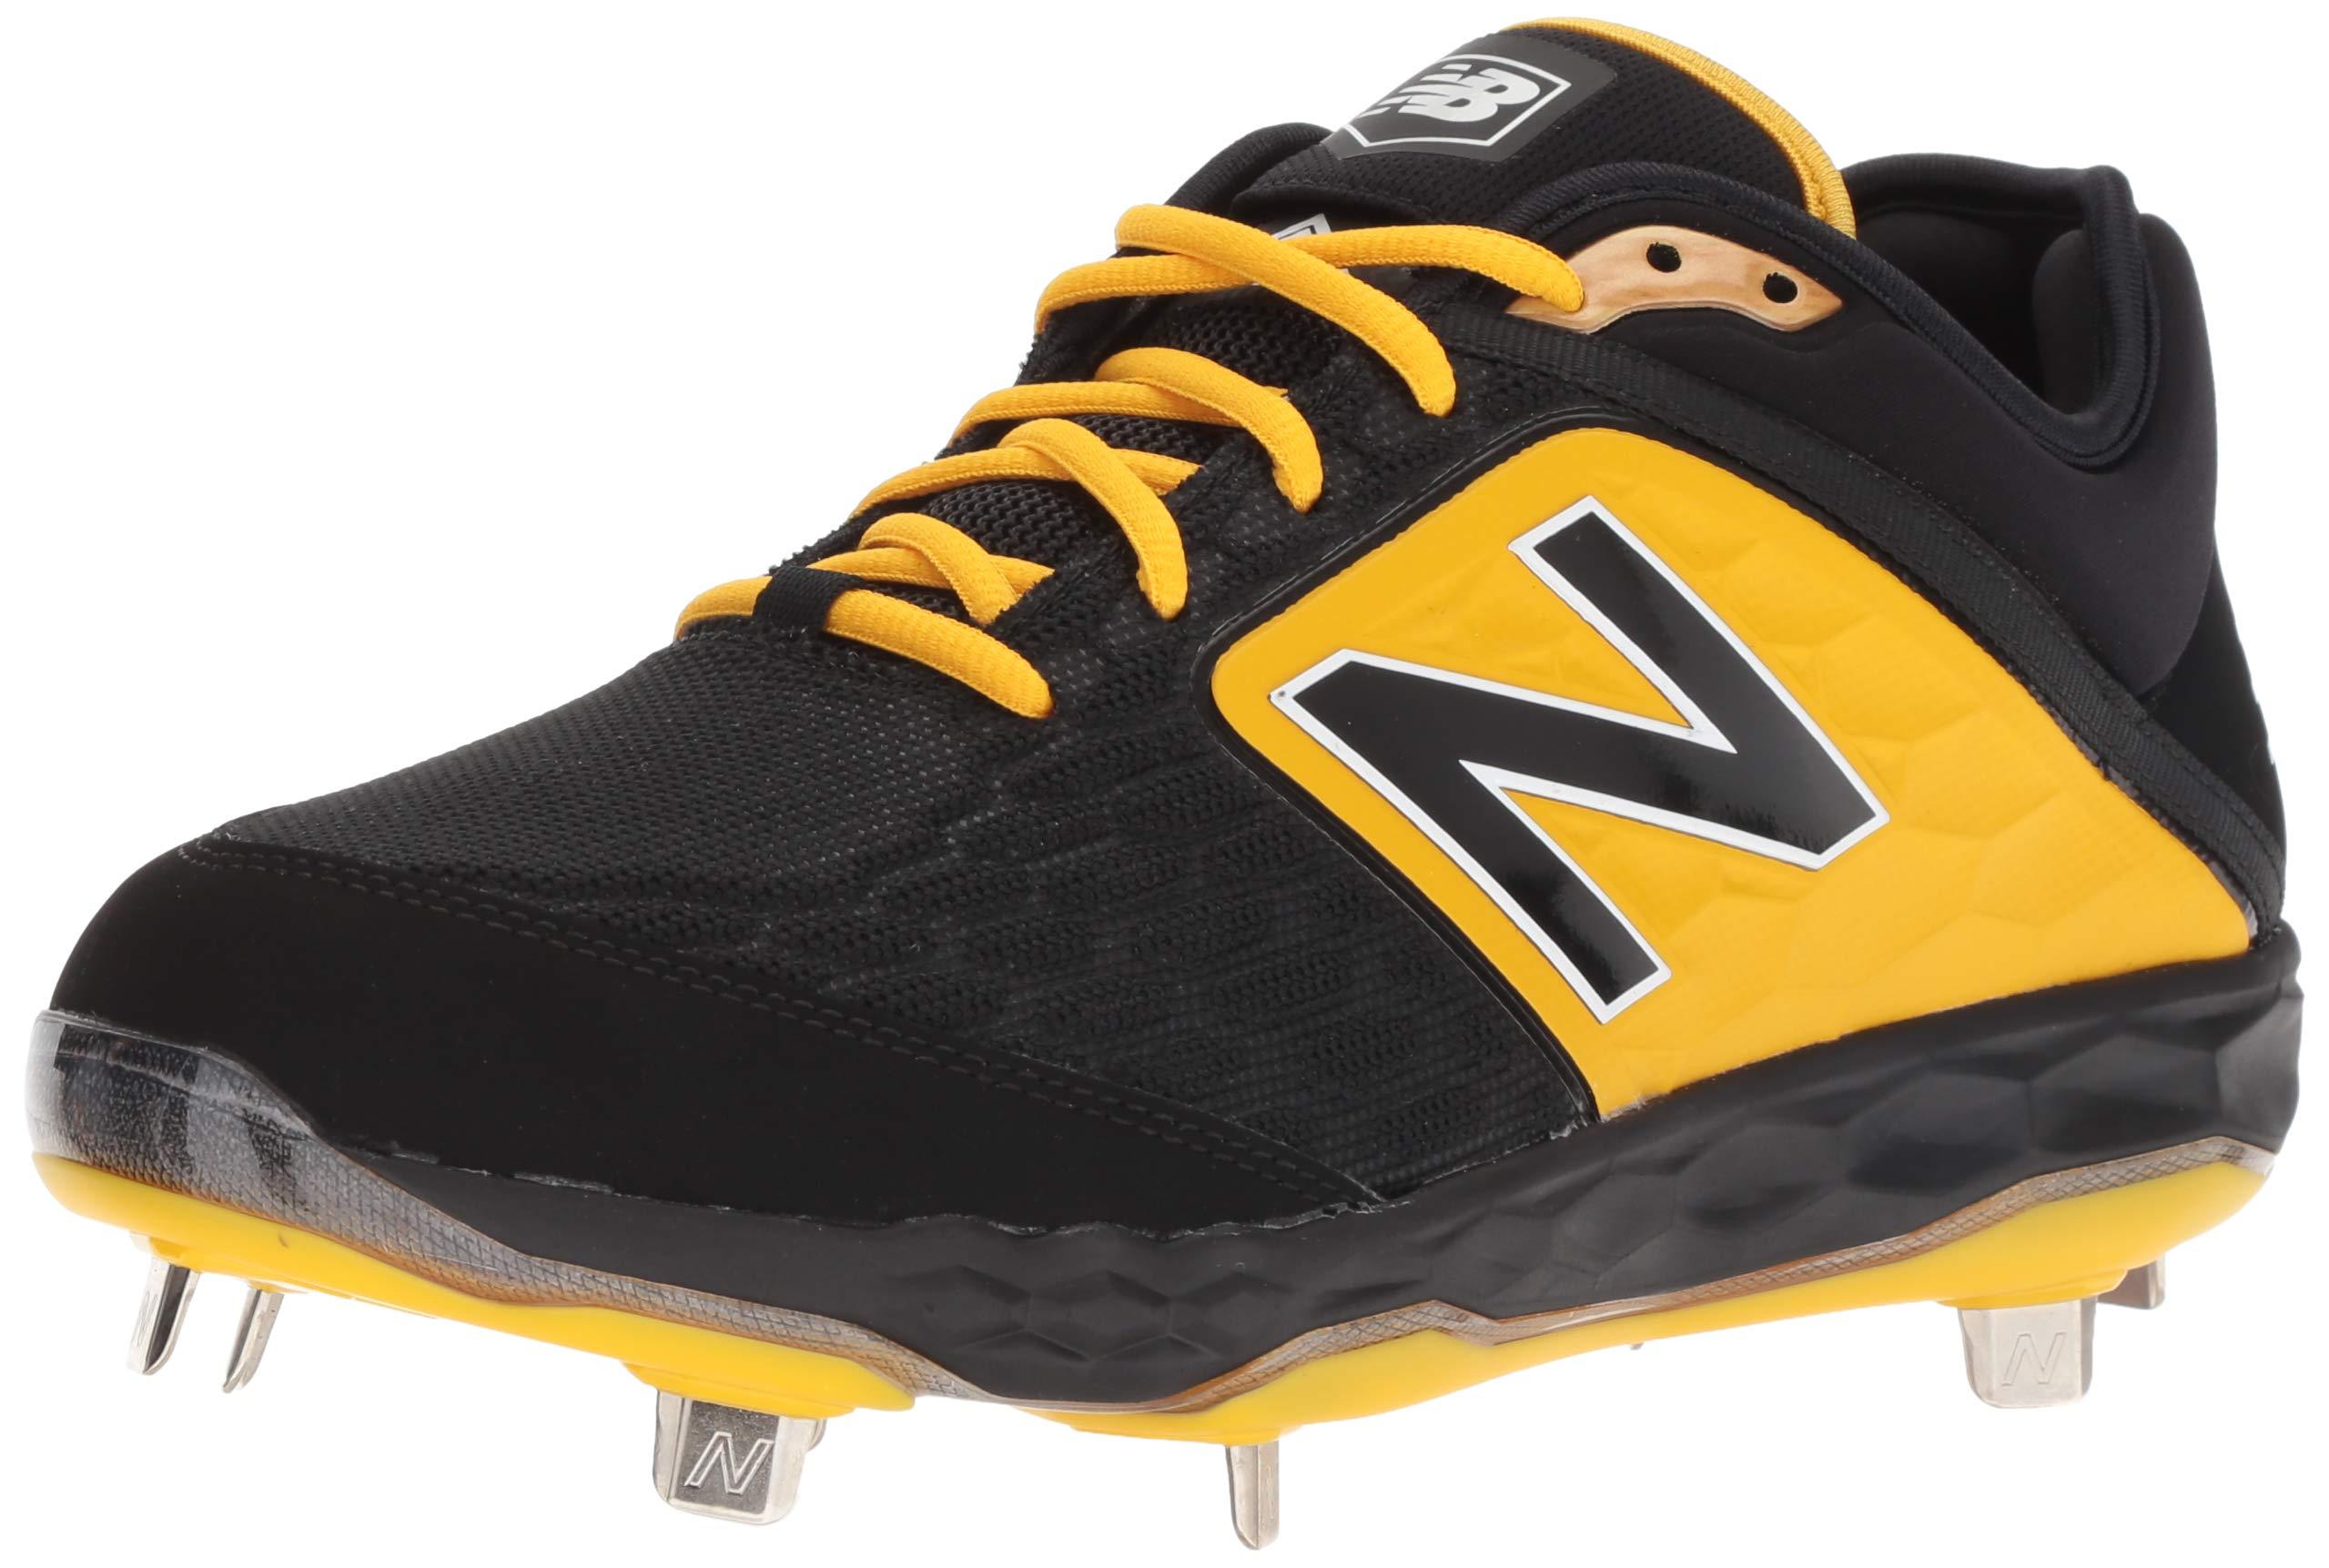 New Balance Men's 3000v4 Baseball Shoe, Black/Yellow, 5 D US